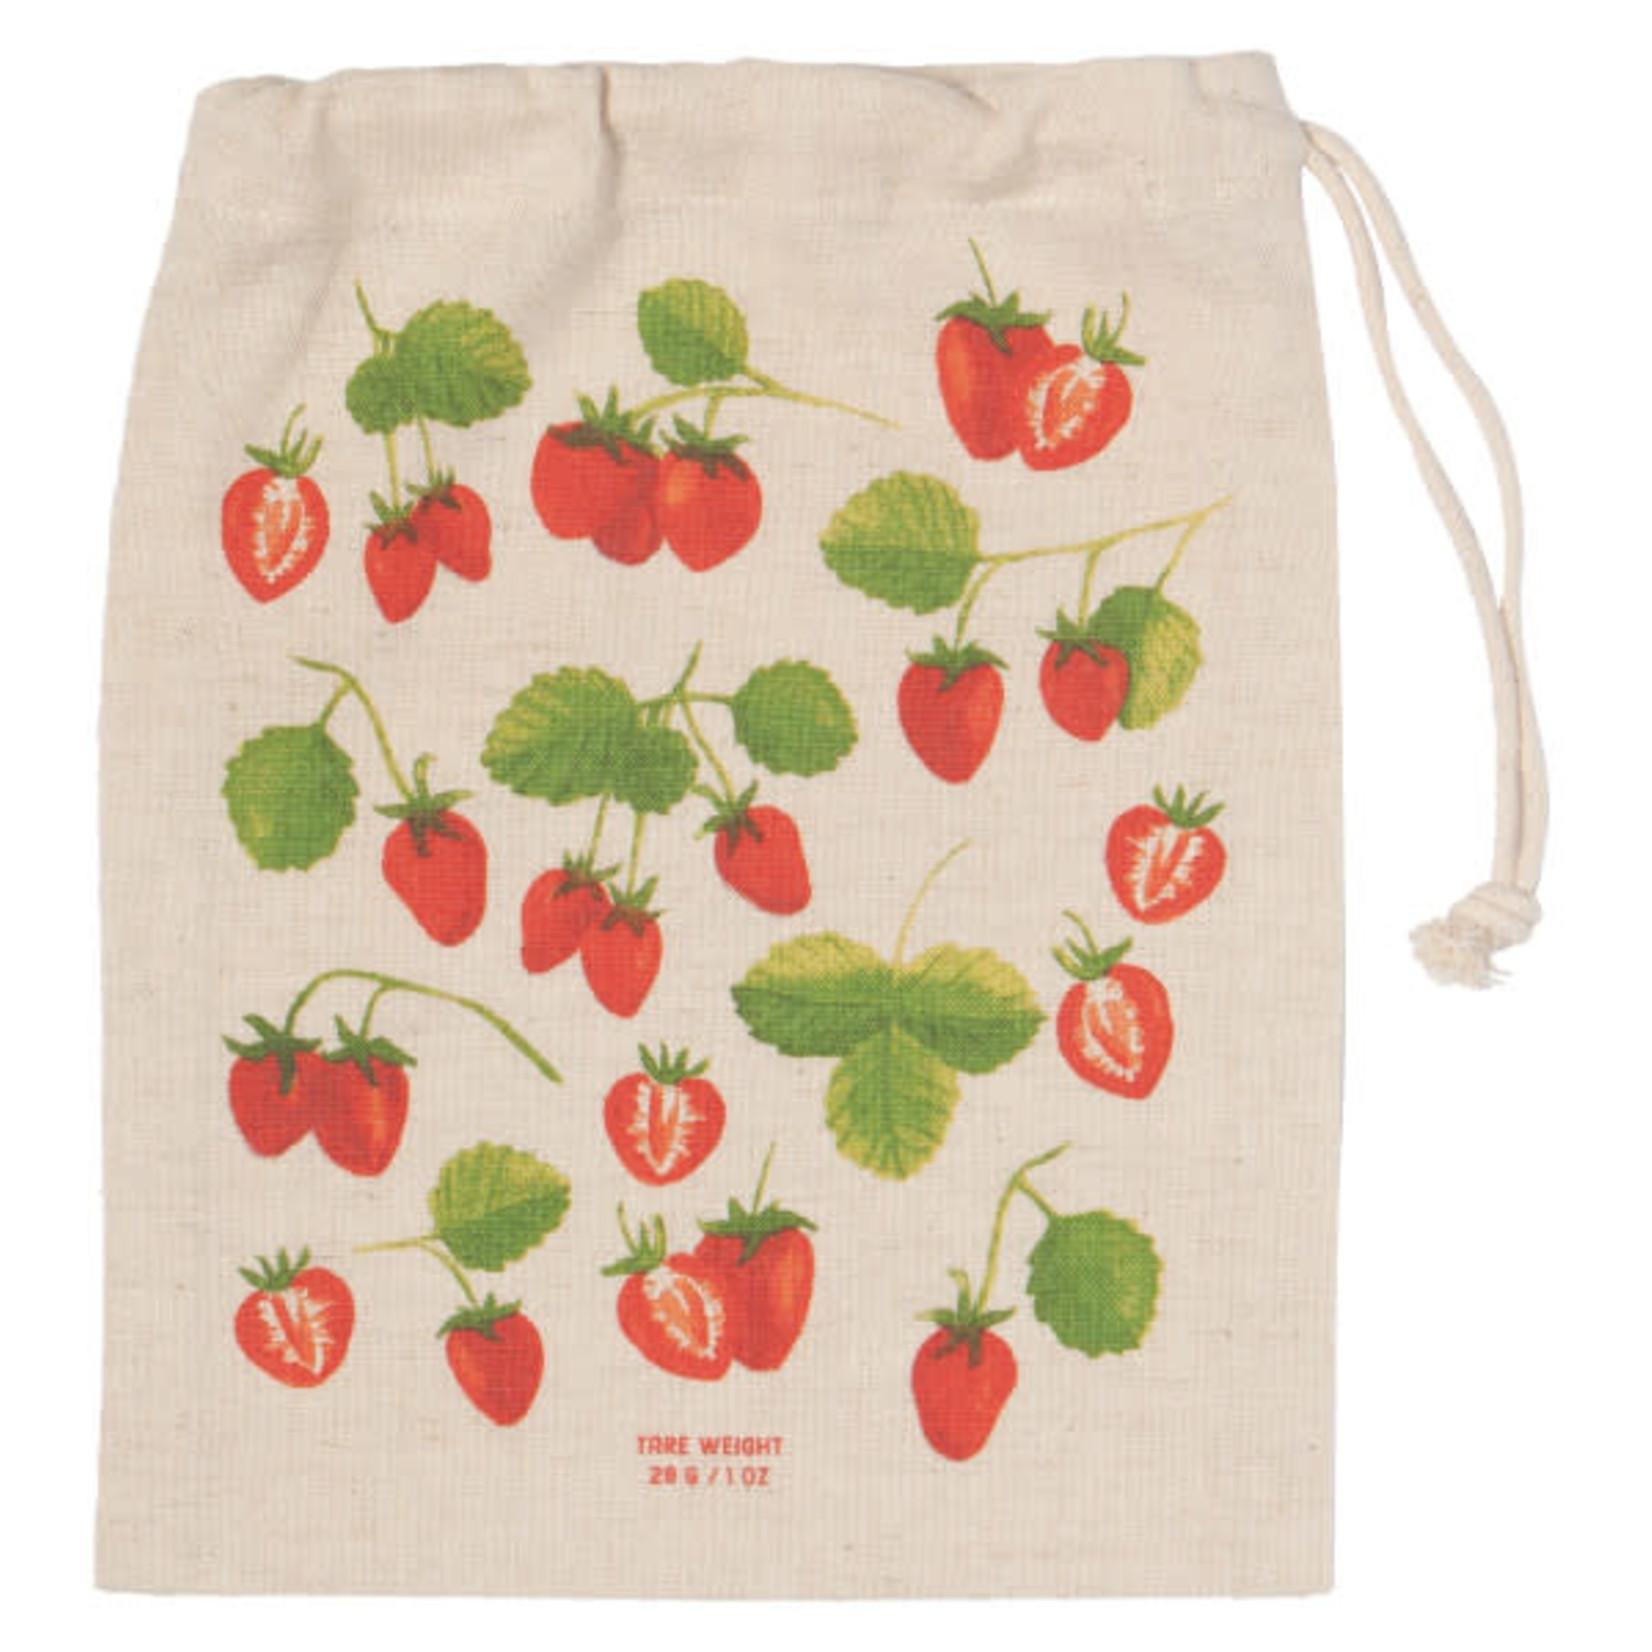 Produce Bag - Fruit Salad